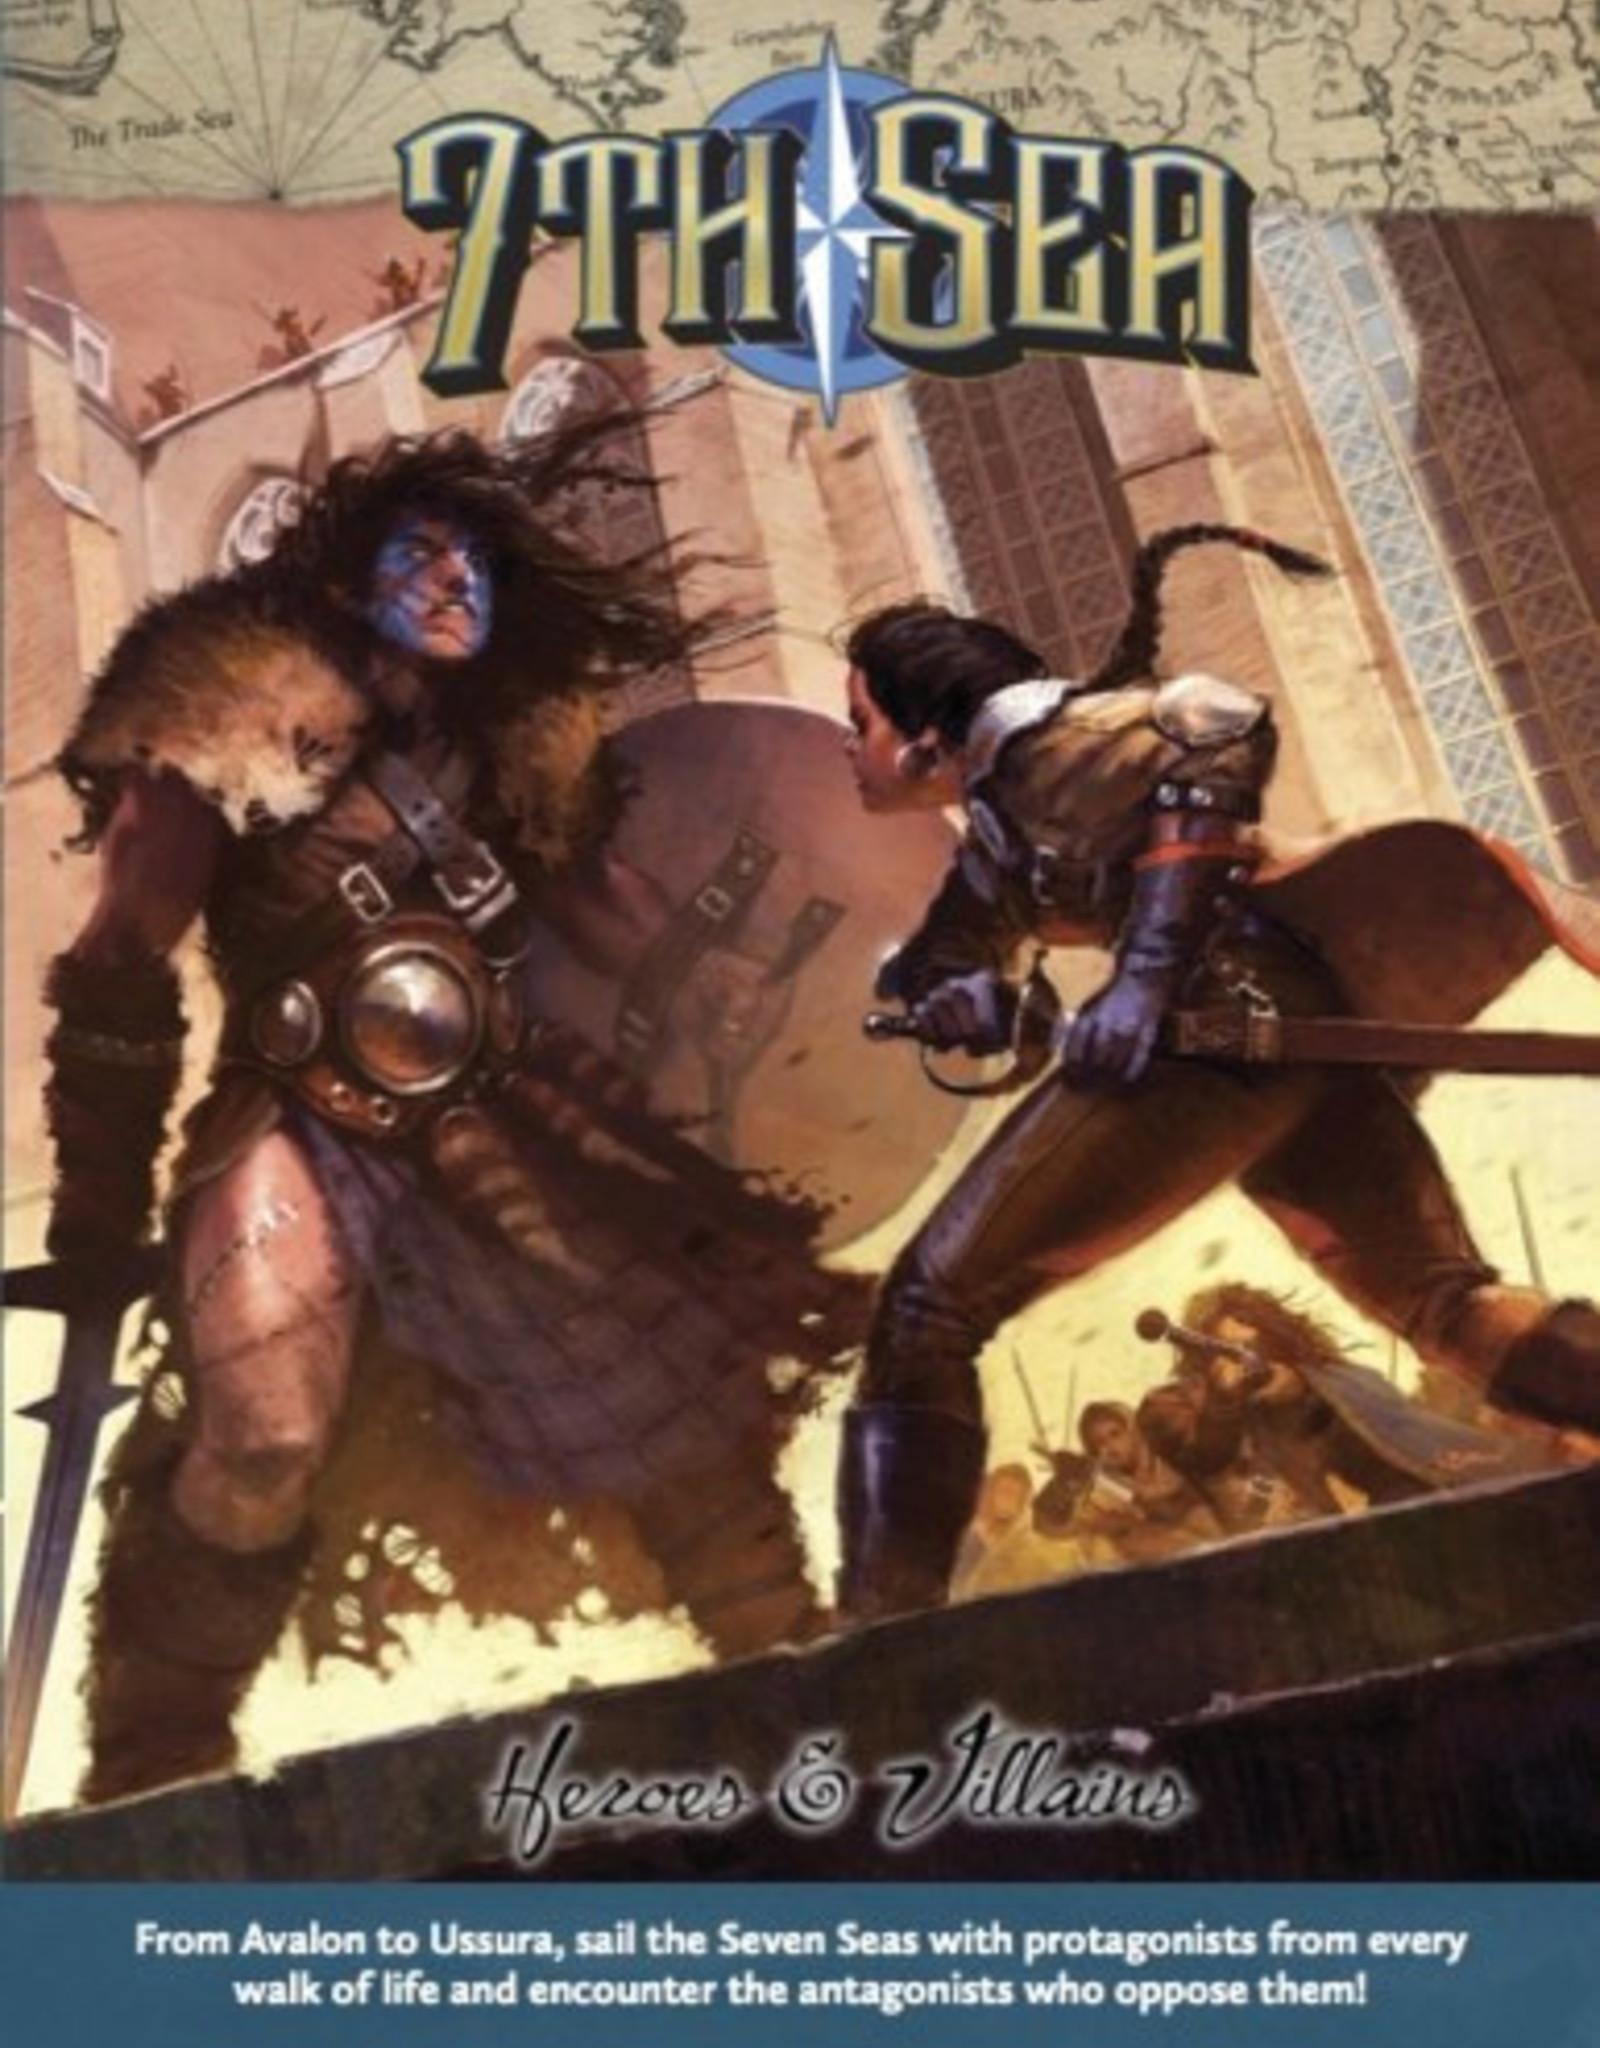 John Wick Presents 7th Sea RPG: Heroes & Villains